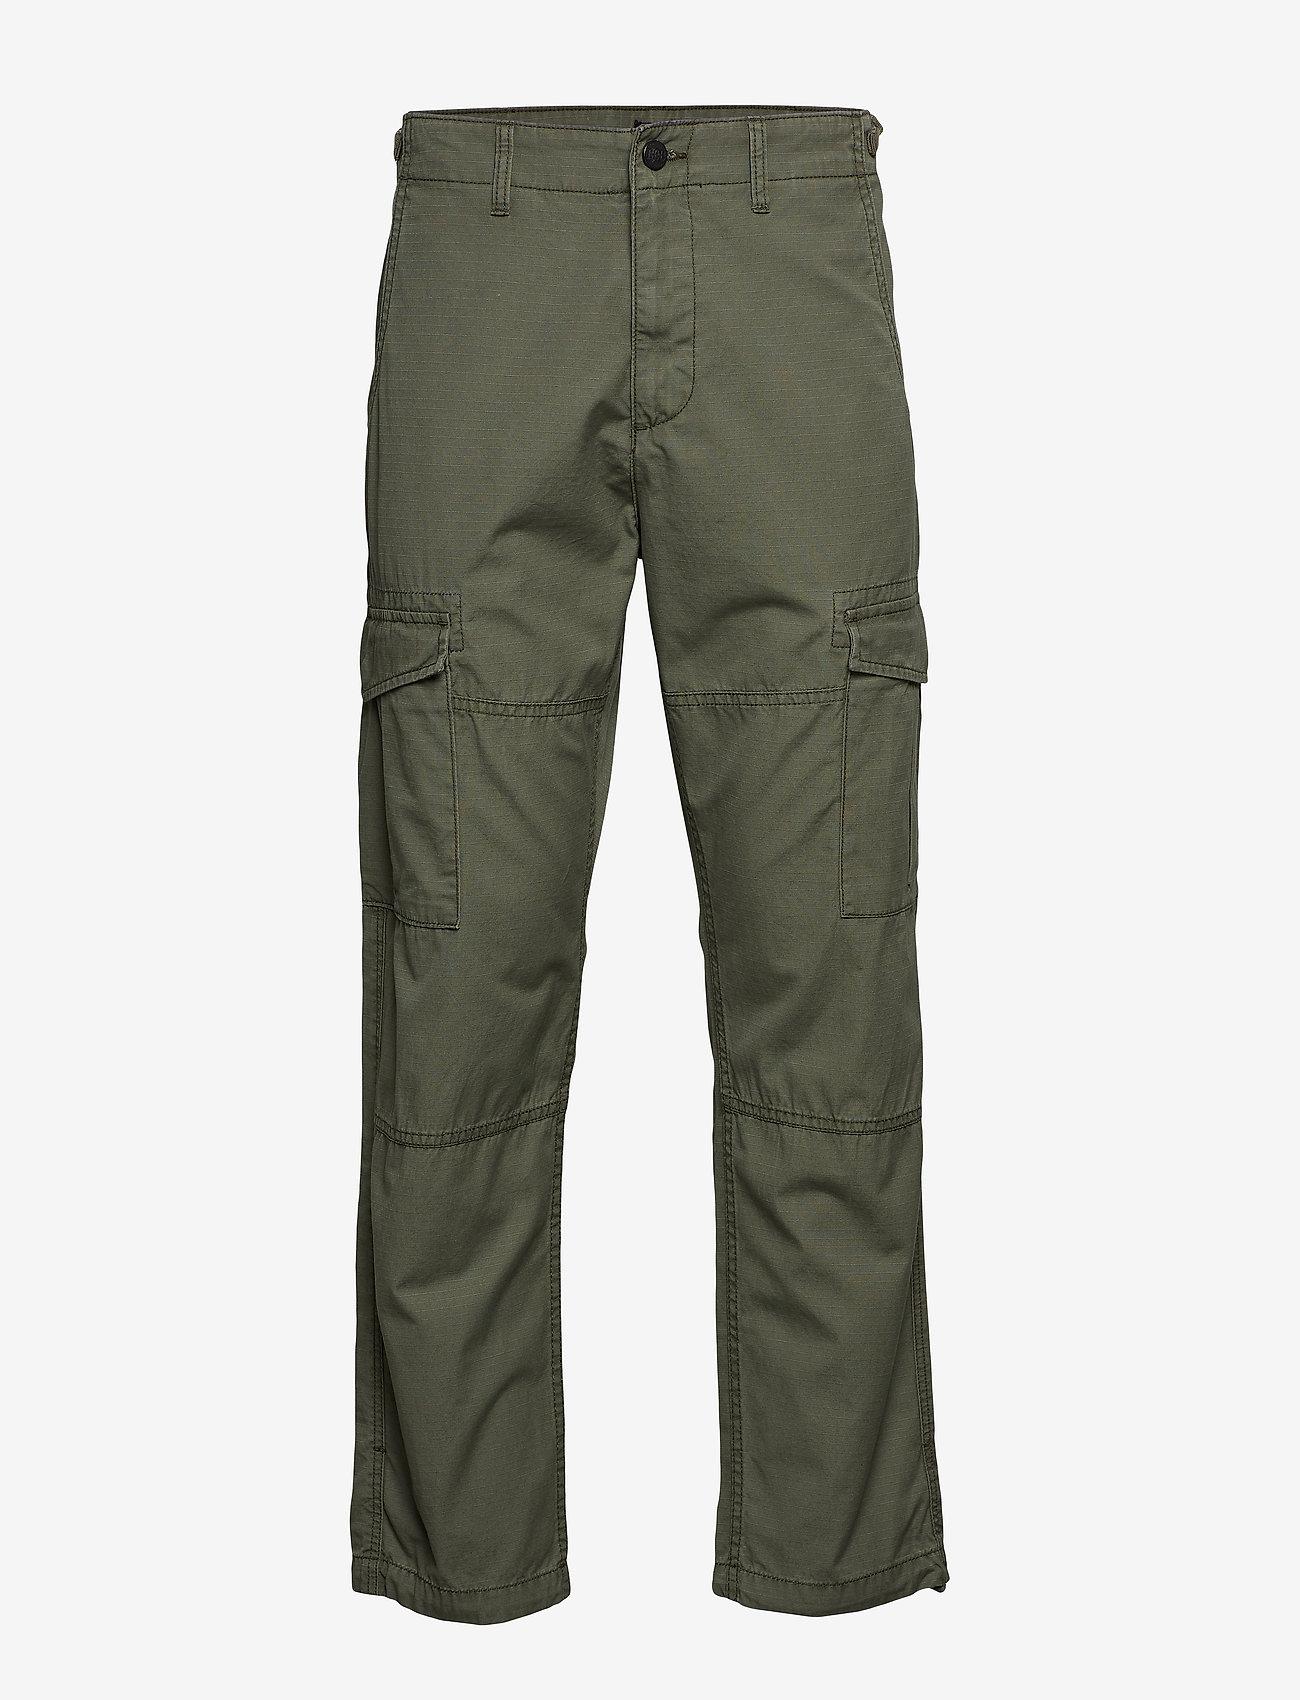 Lee Jeans - FATIGUE PANT - bojówki - khaki - 0